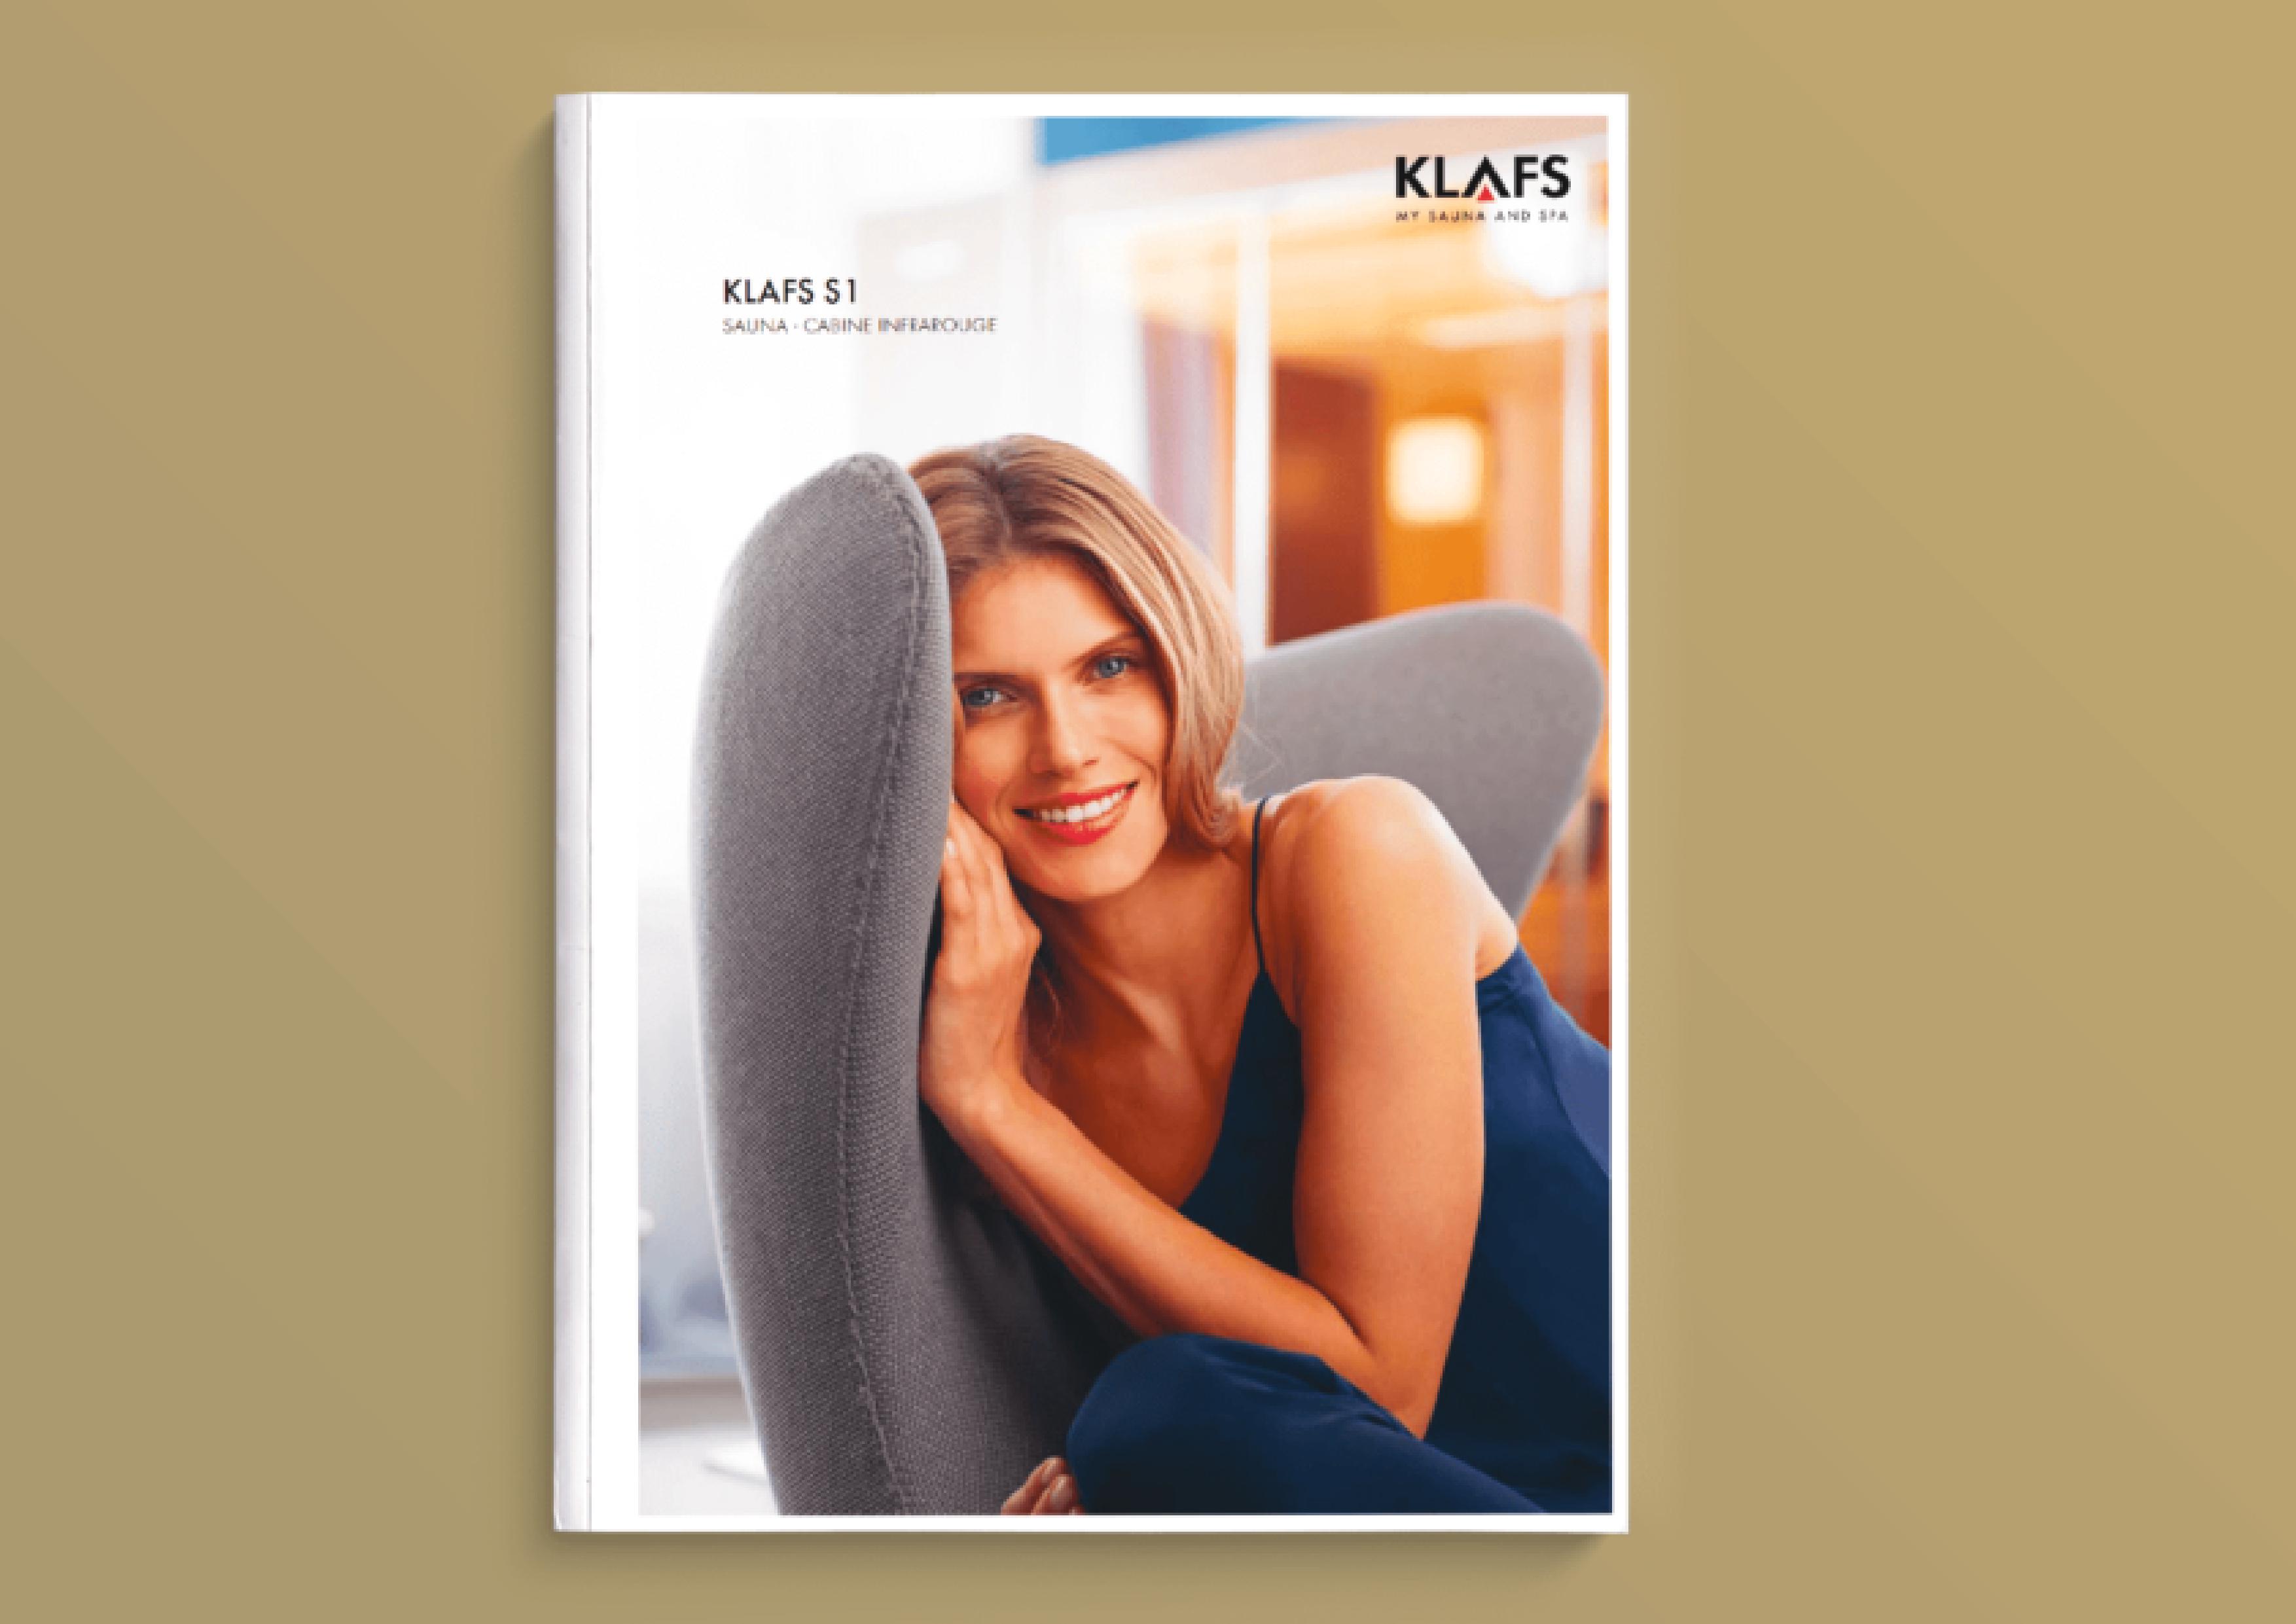 catalogue 2 klafs